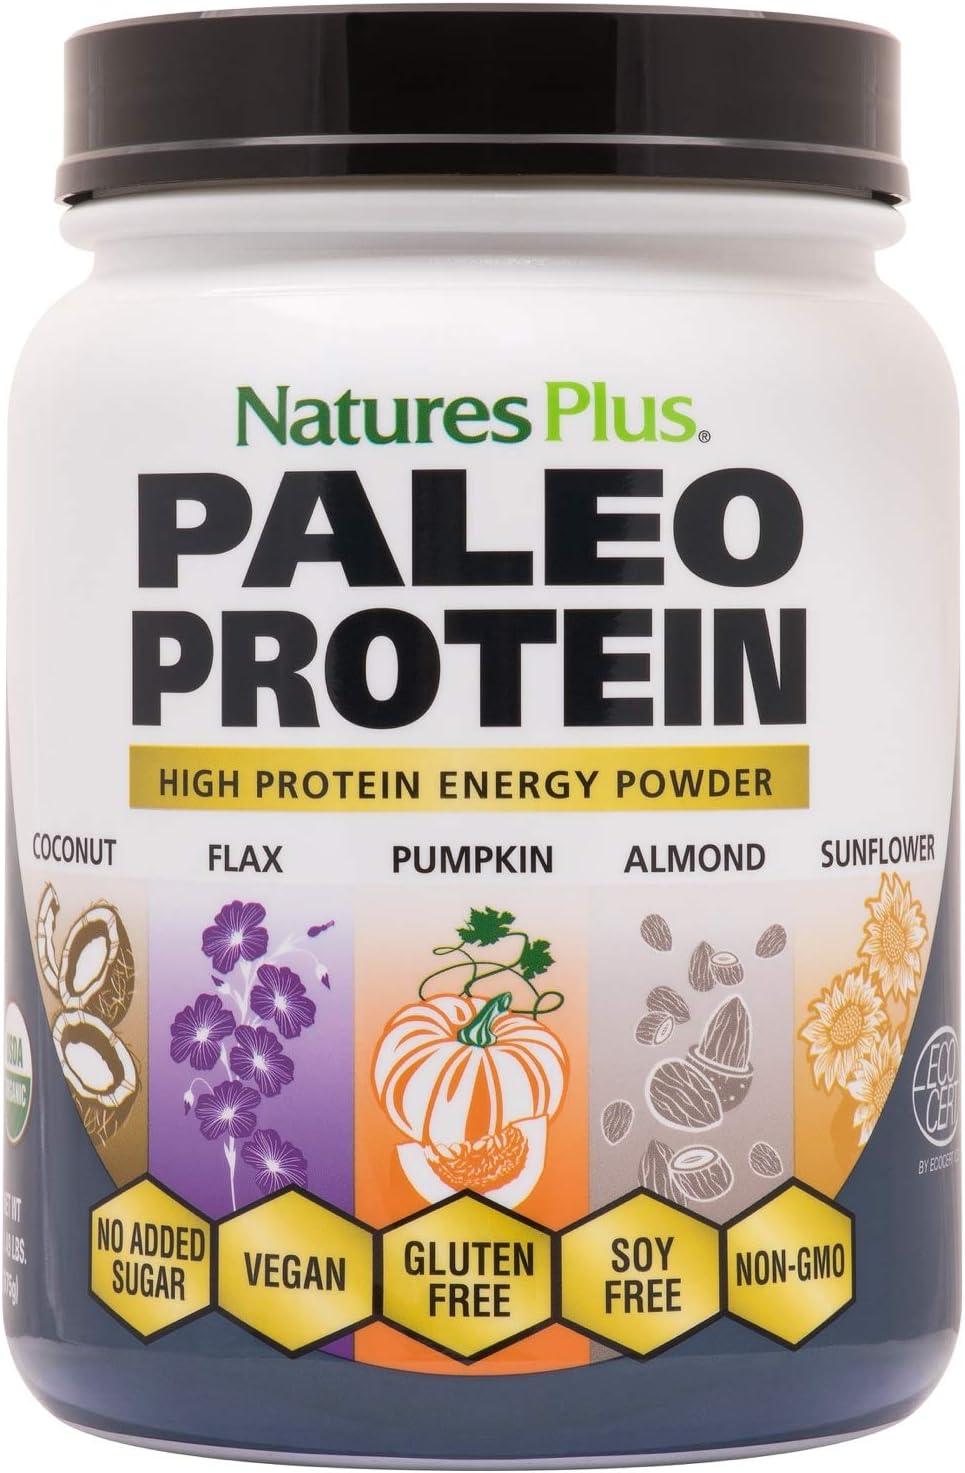 NaturesPlus Organic Paleo Protein - 1.49 lbs, 20 g Protein, Vegan Protein Powder - Unflavored, Unsweetened - Certified Organic High Protein Energy Protein - Vegetarian, Gluten-Free - 15 Servings